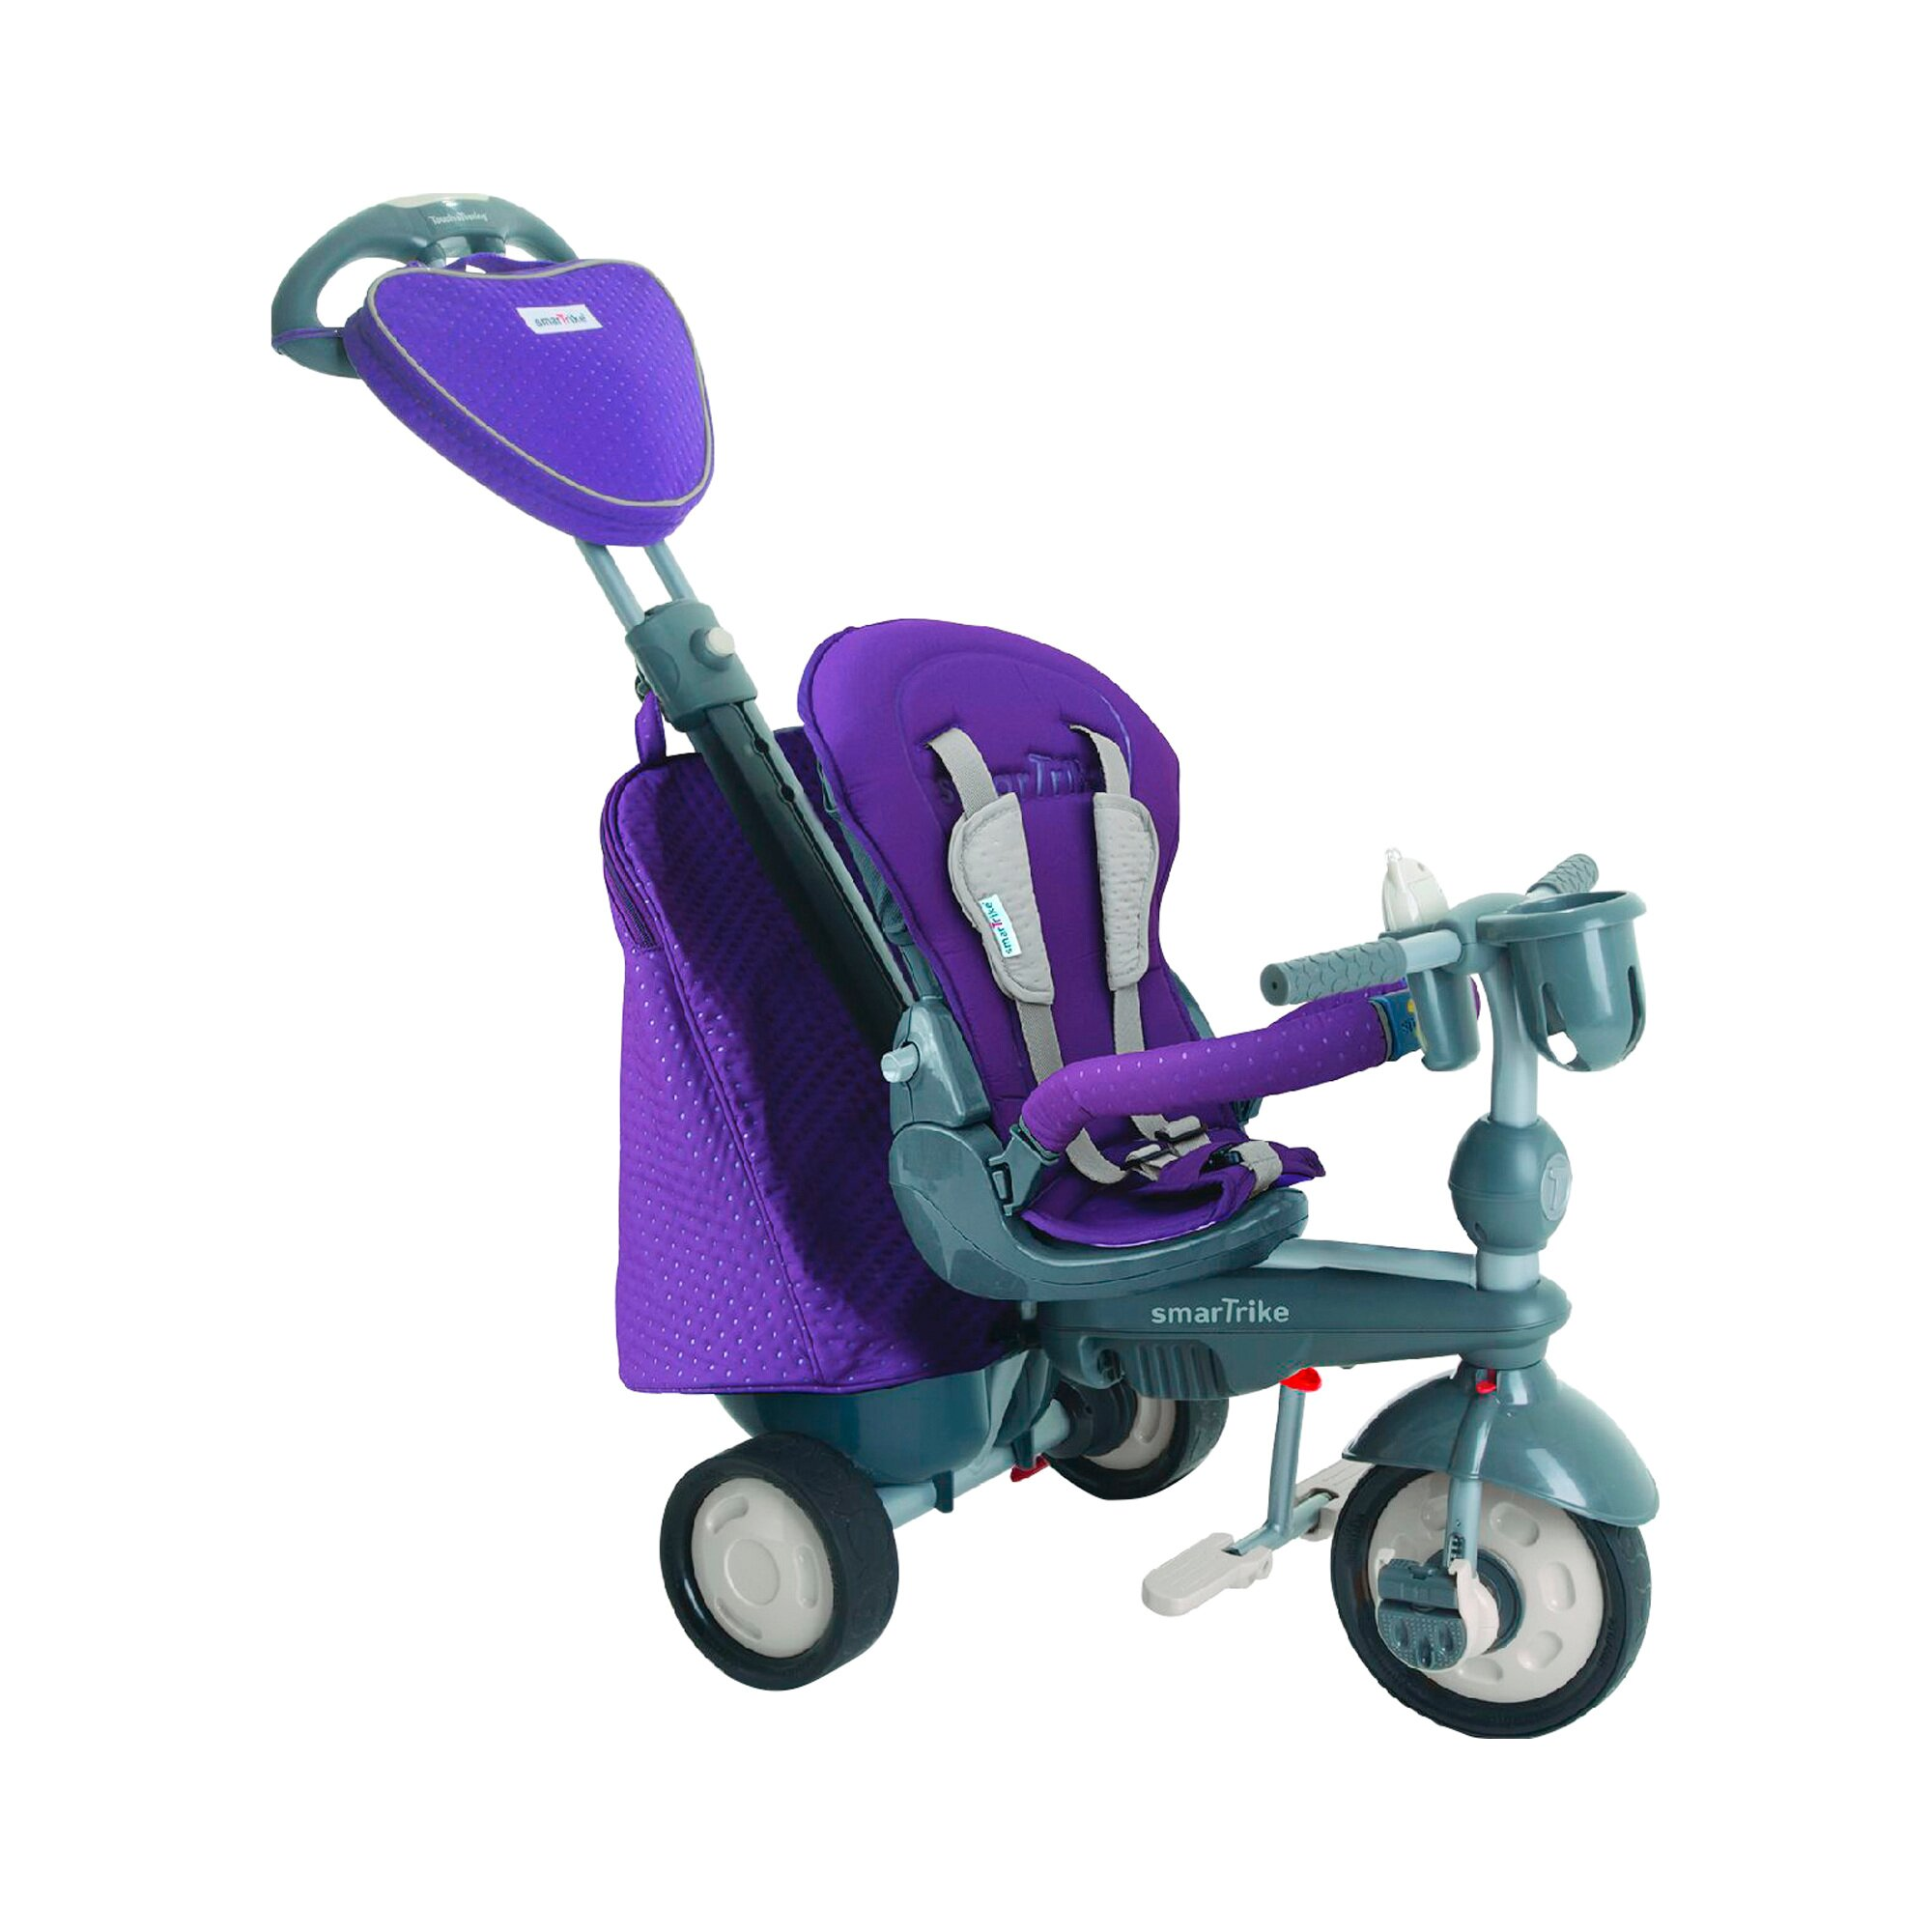 smartrike-dreirad-recliner-infinity-5-in-1-baby-trike